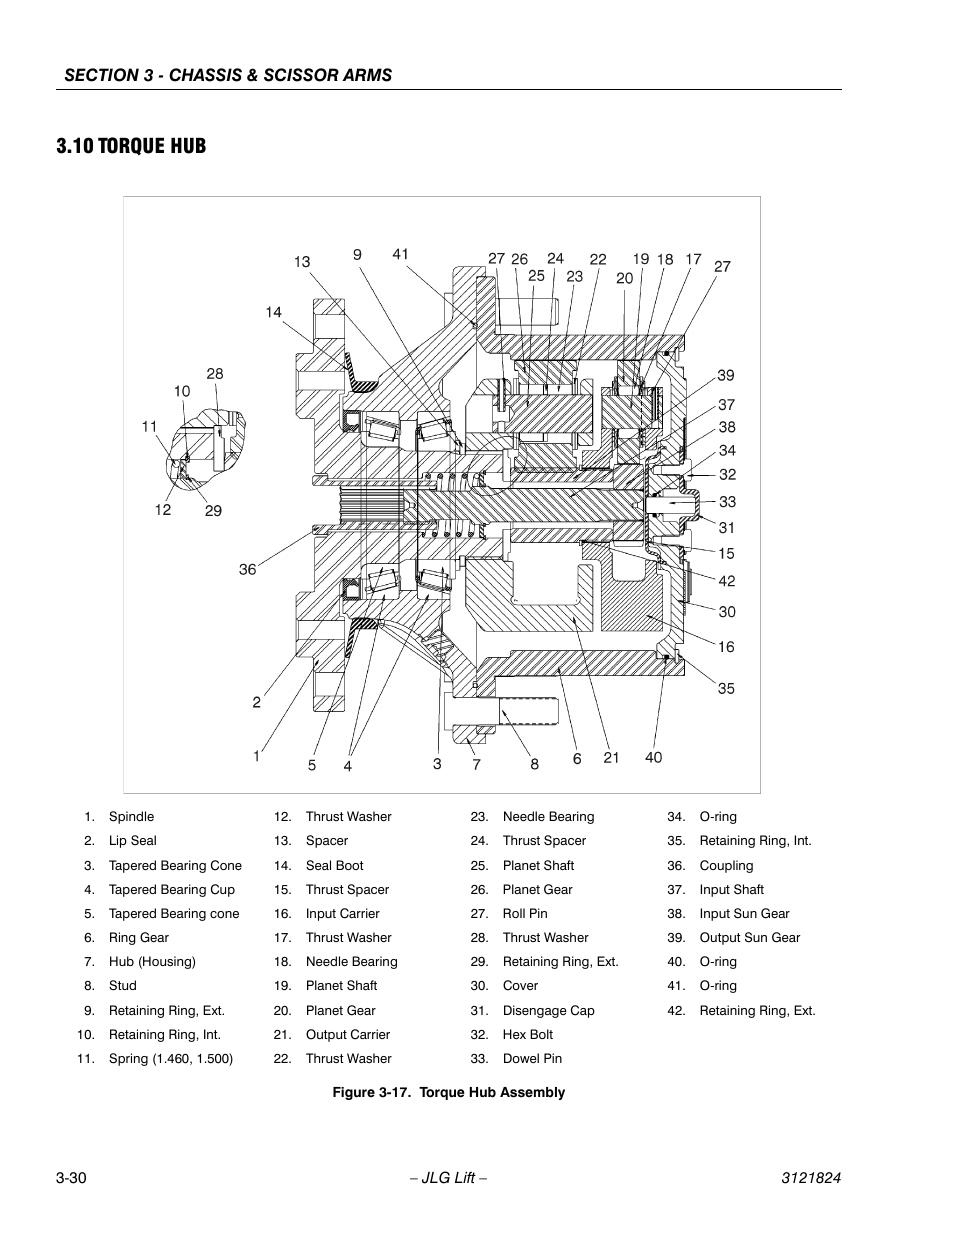 10 torque hub, Torque hub -30, Torque hub assembly -30   JLG